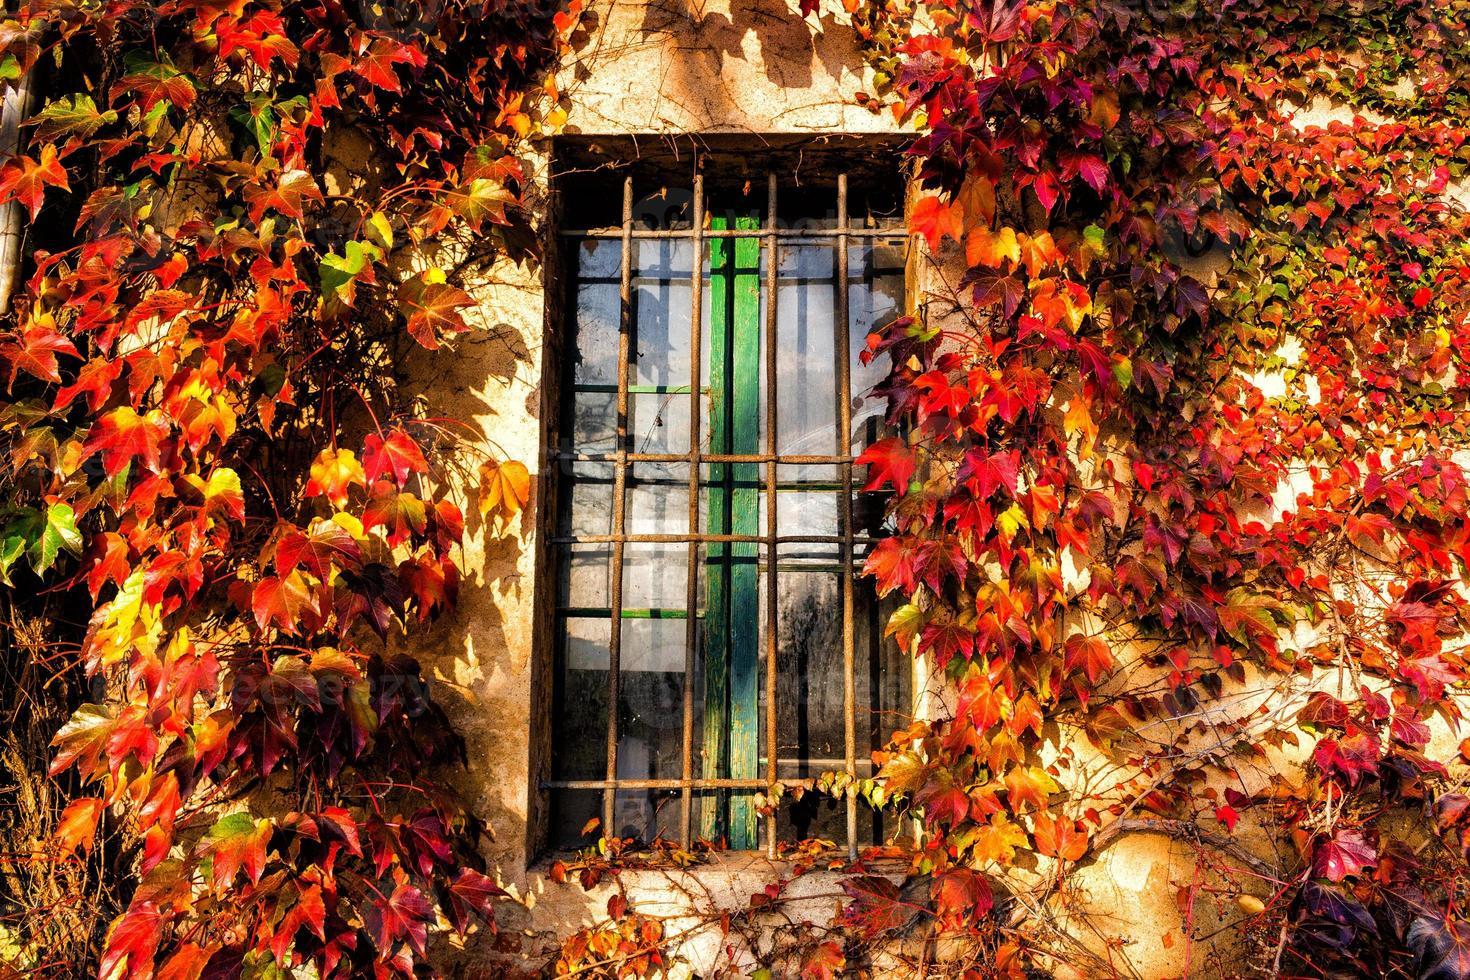 Boston ivy and iron grate window photo